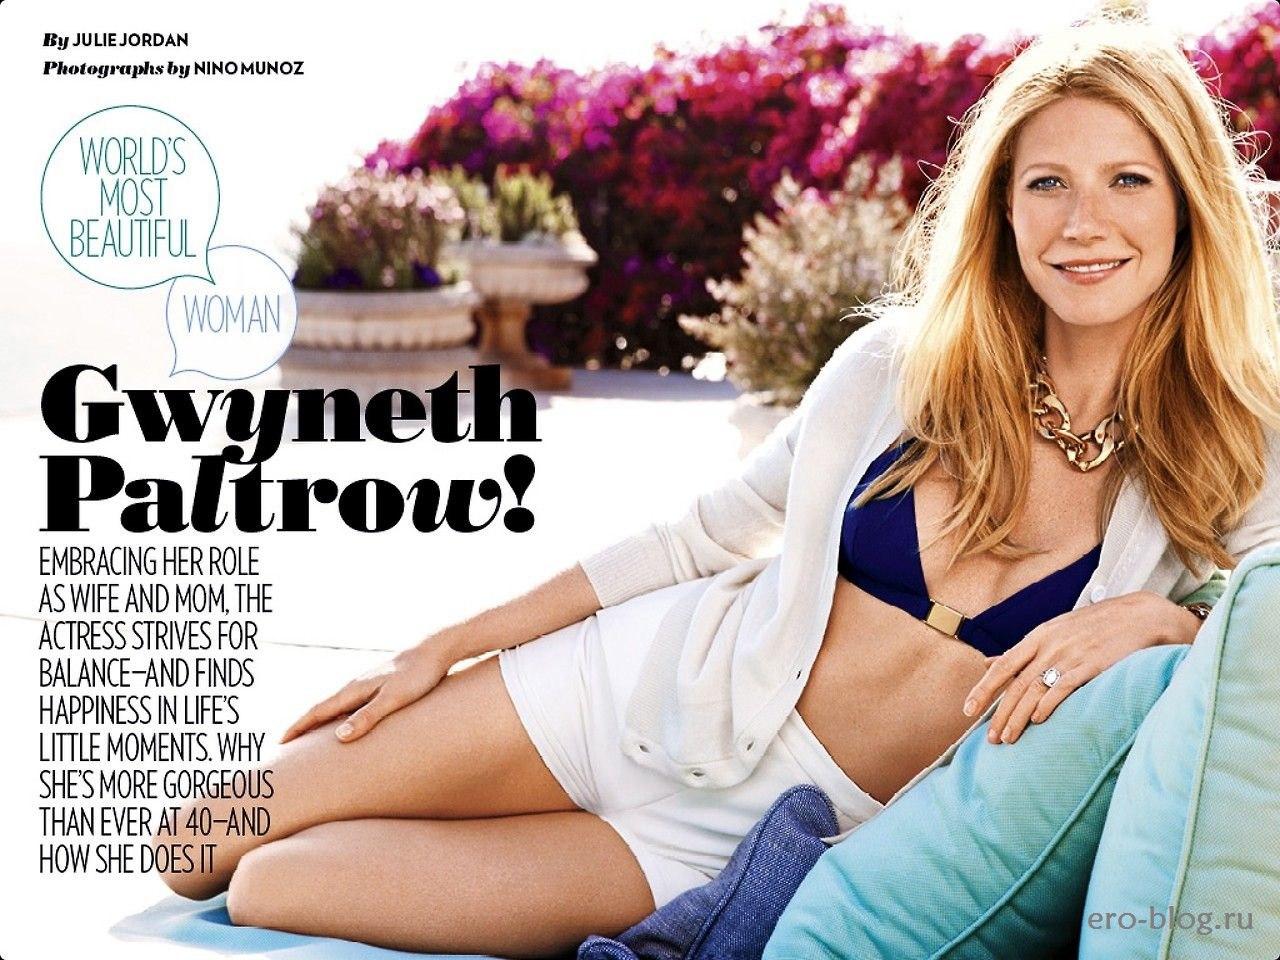 Голая обнаженная Gwyneth Paltrow | Гвинет Пэлтроу интимные фото звезды